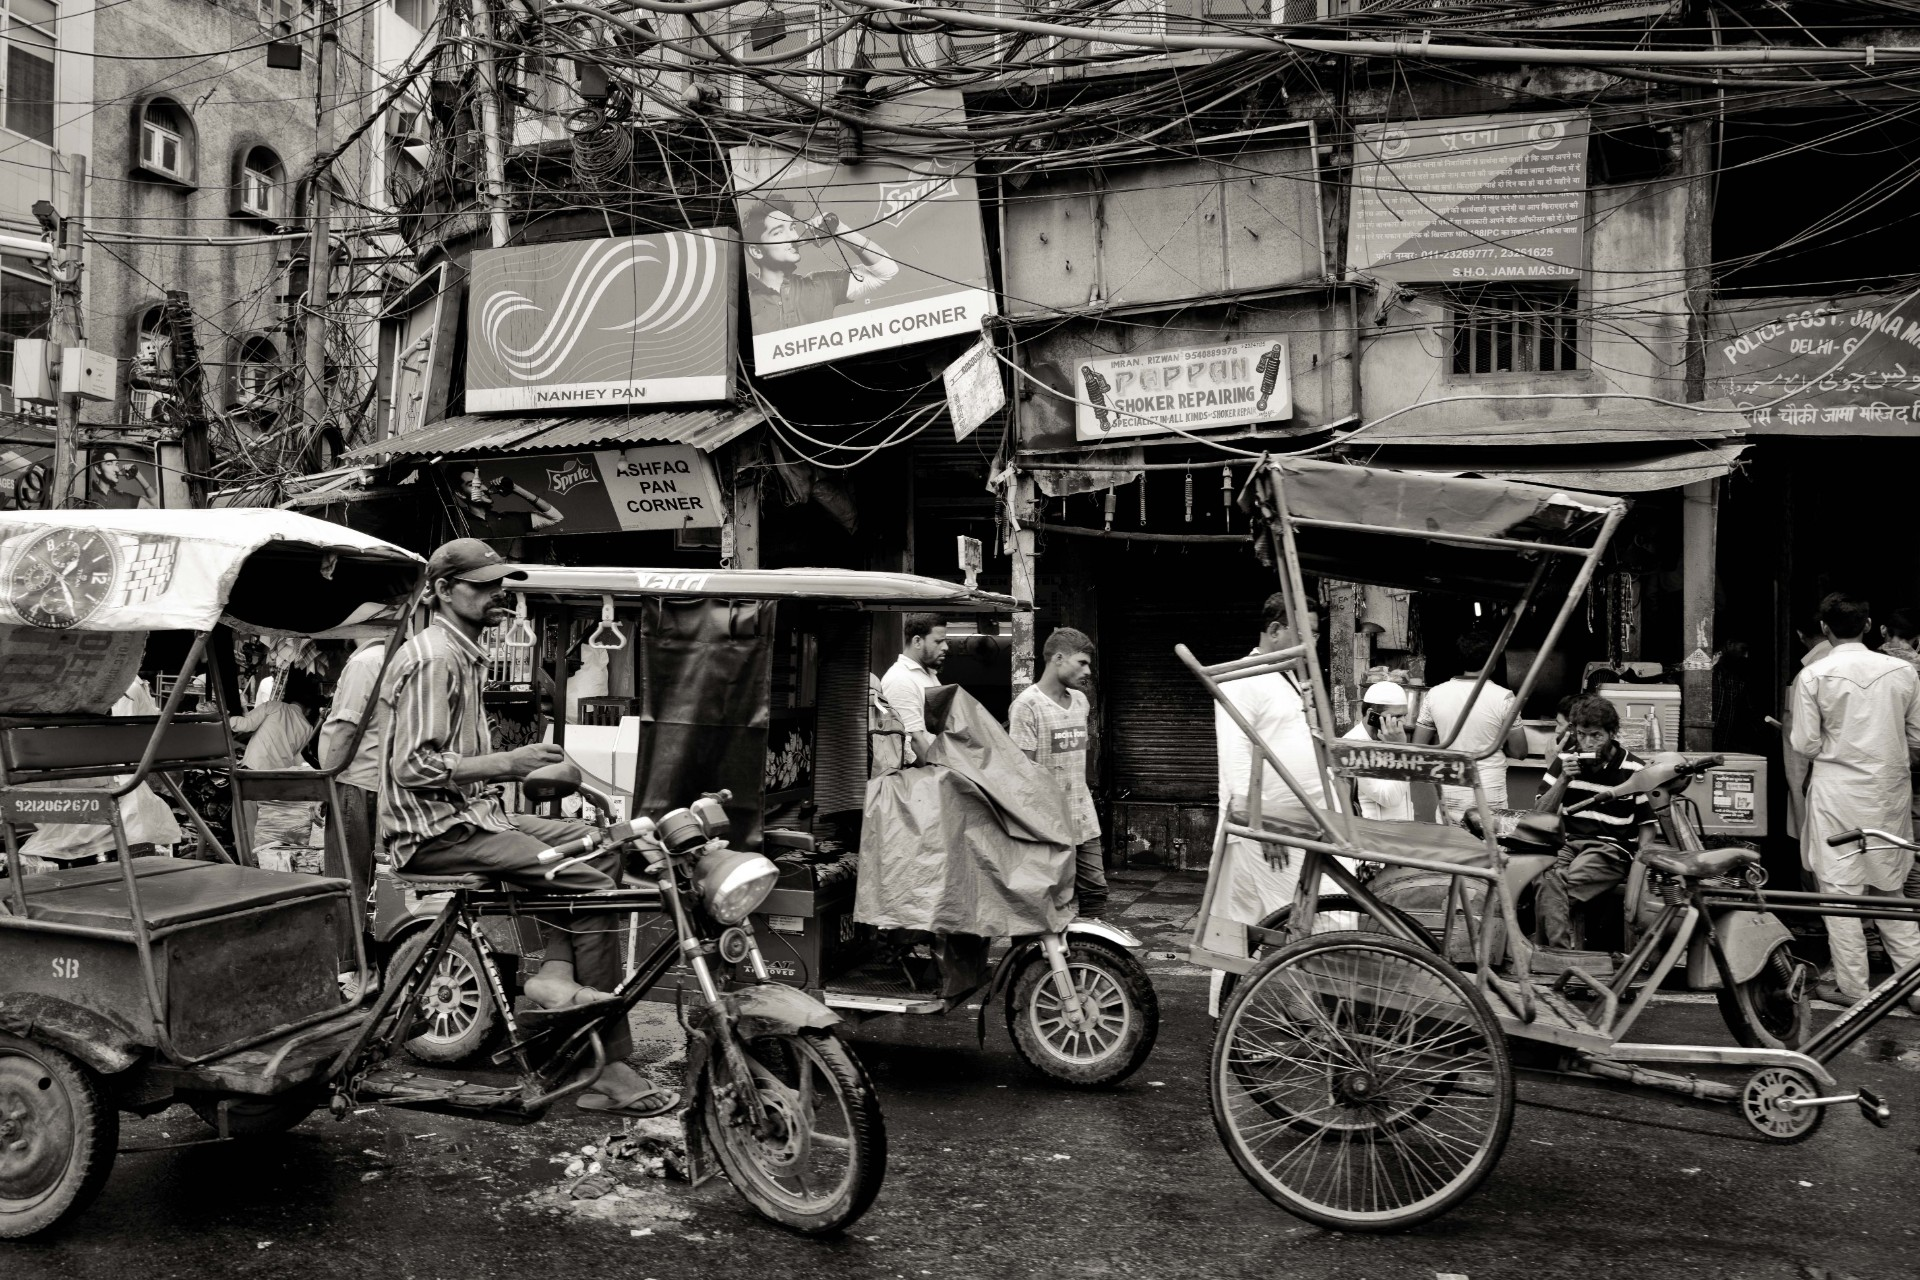 10-Delhi-09-09